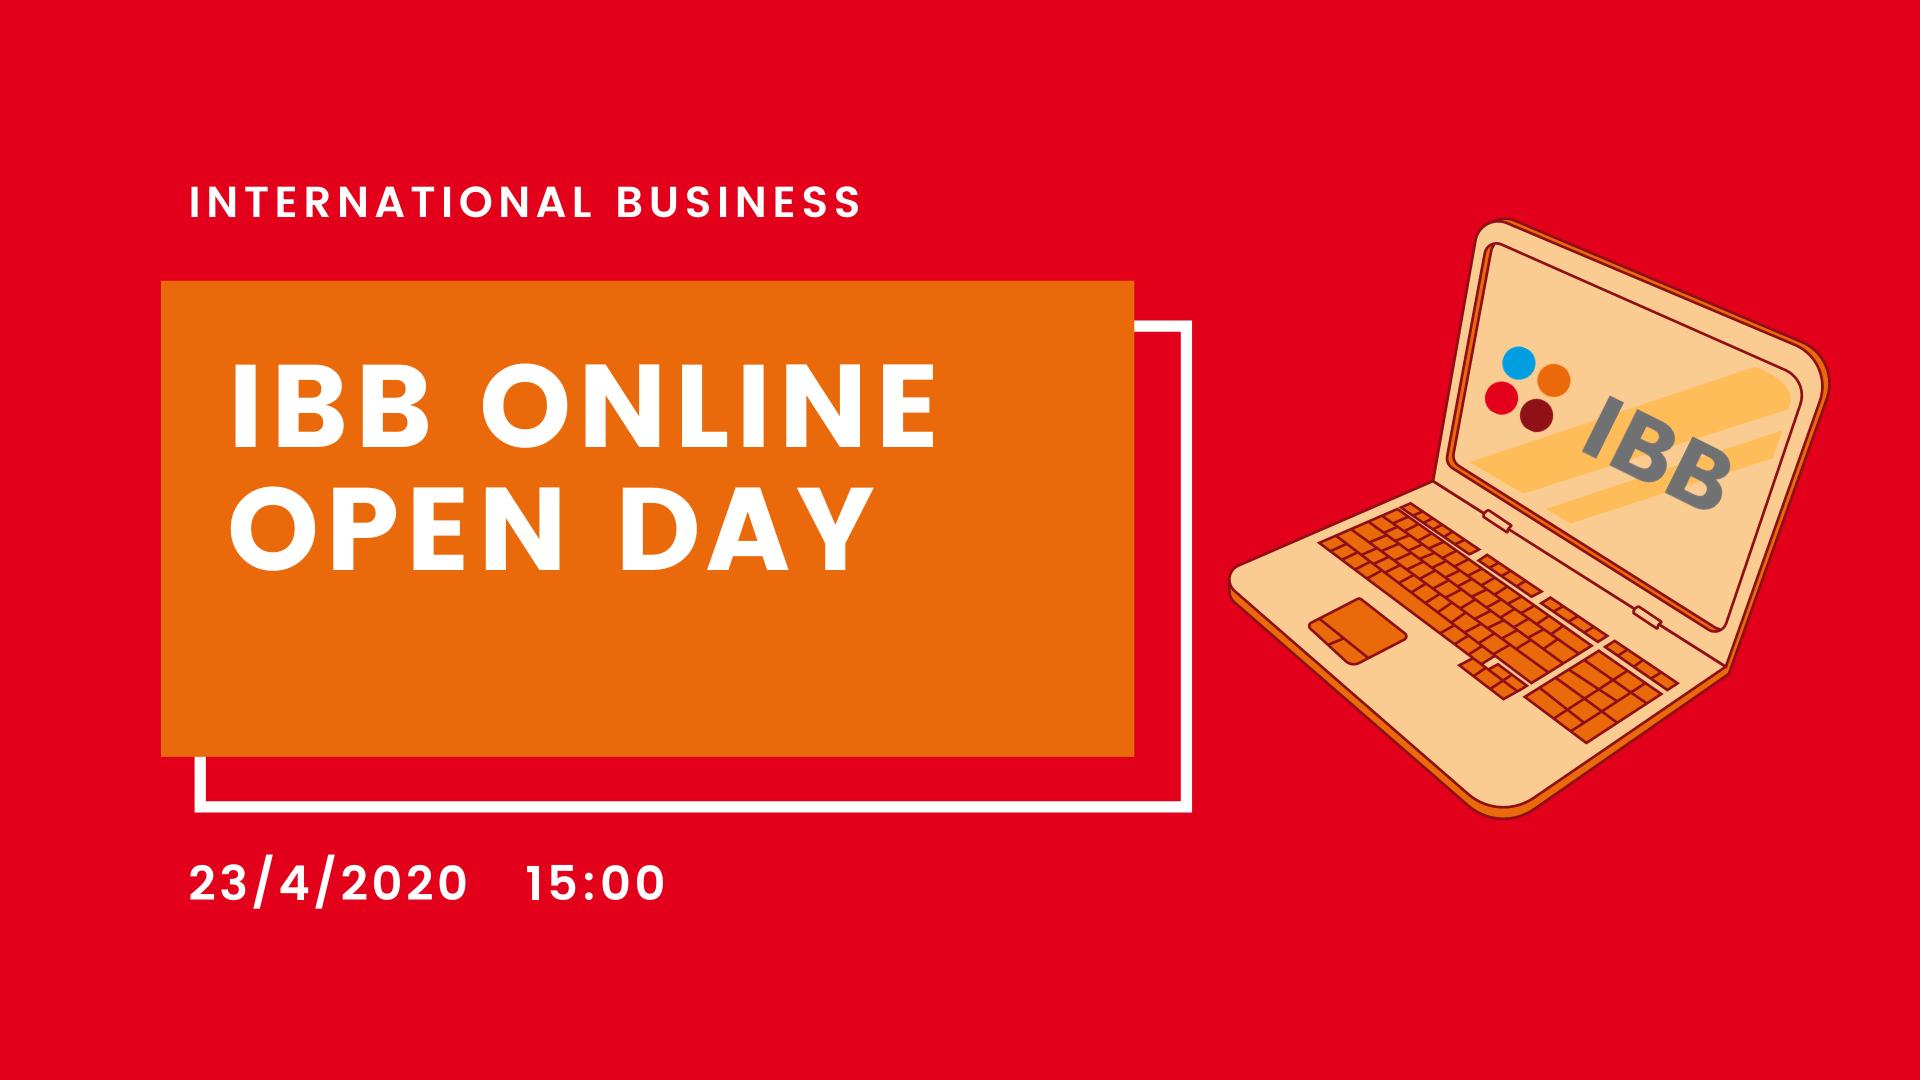 IBB Online Open Day /April 23, 2020/